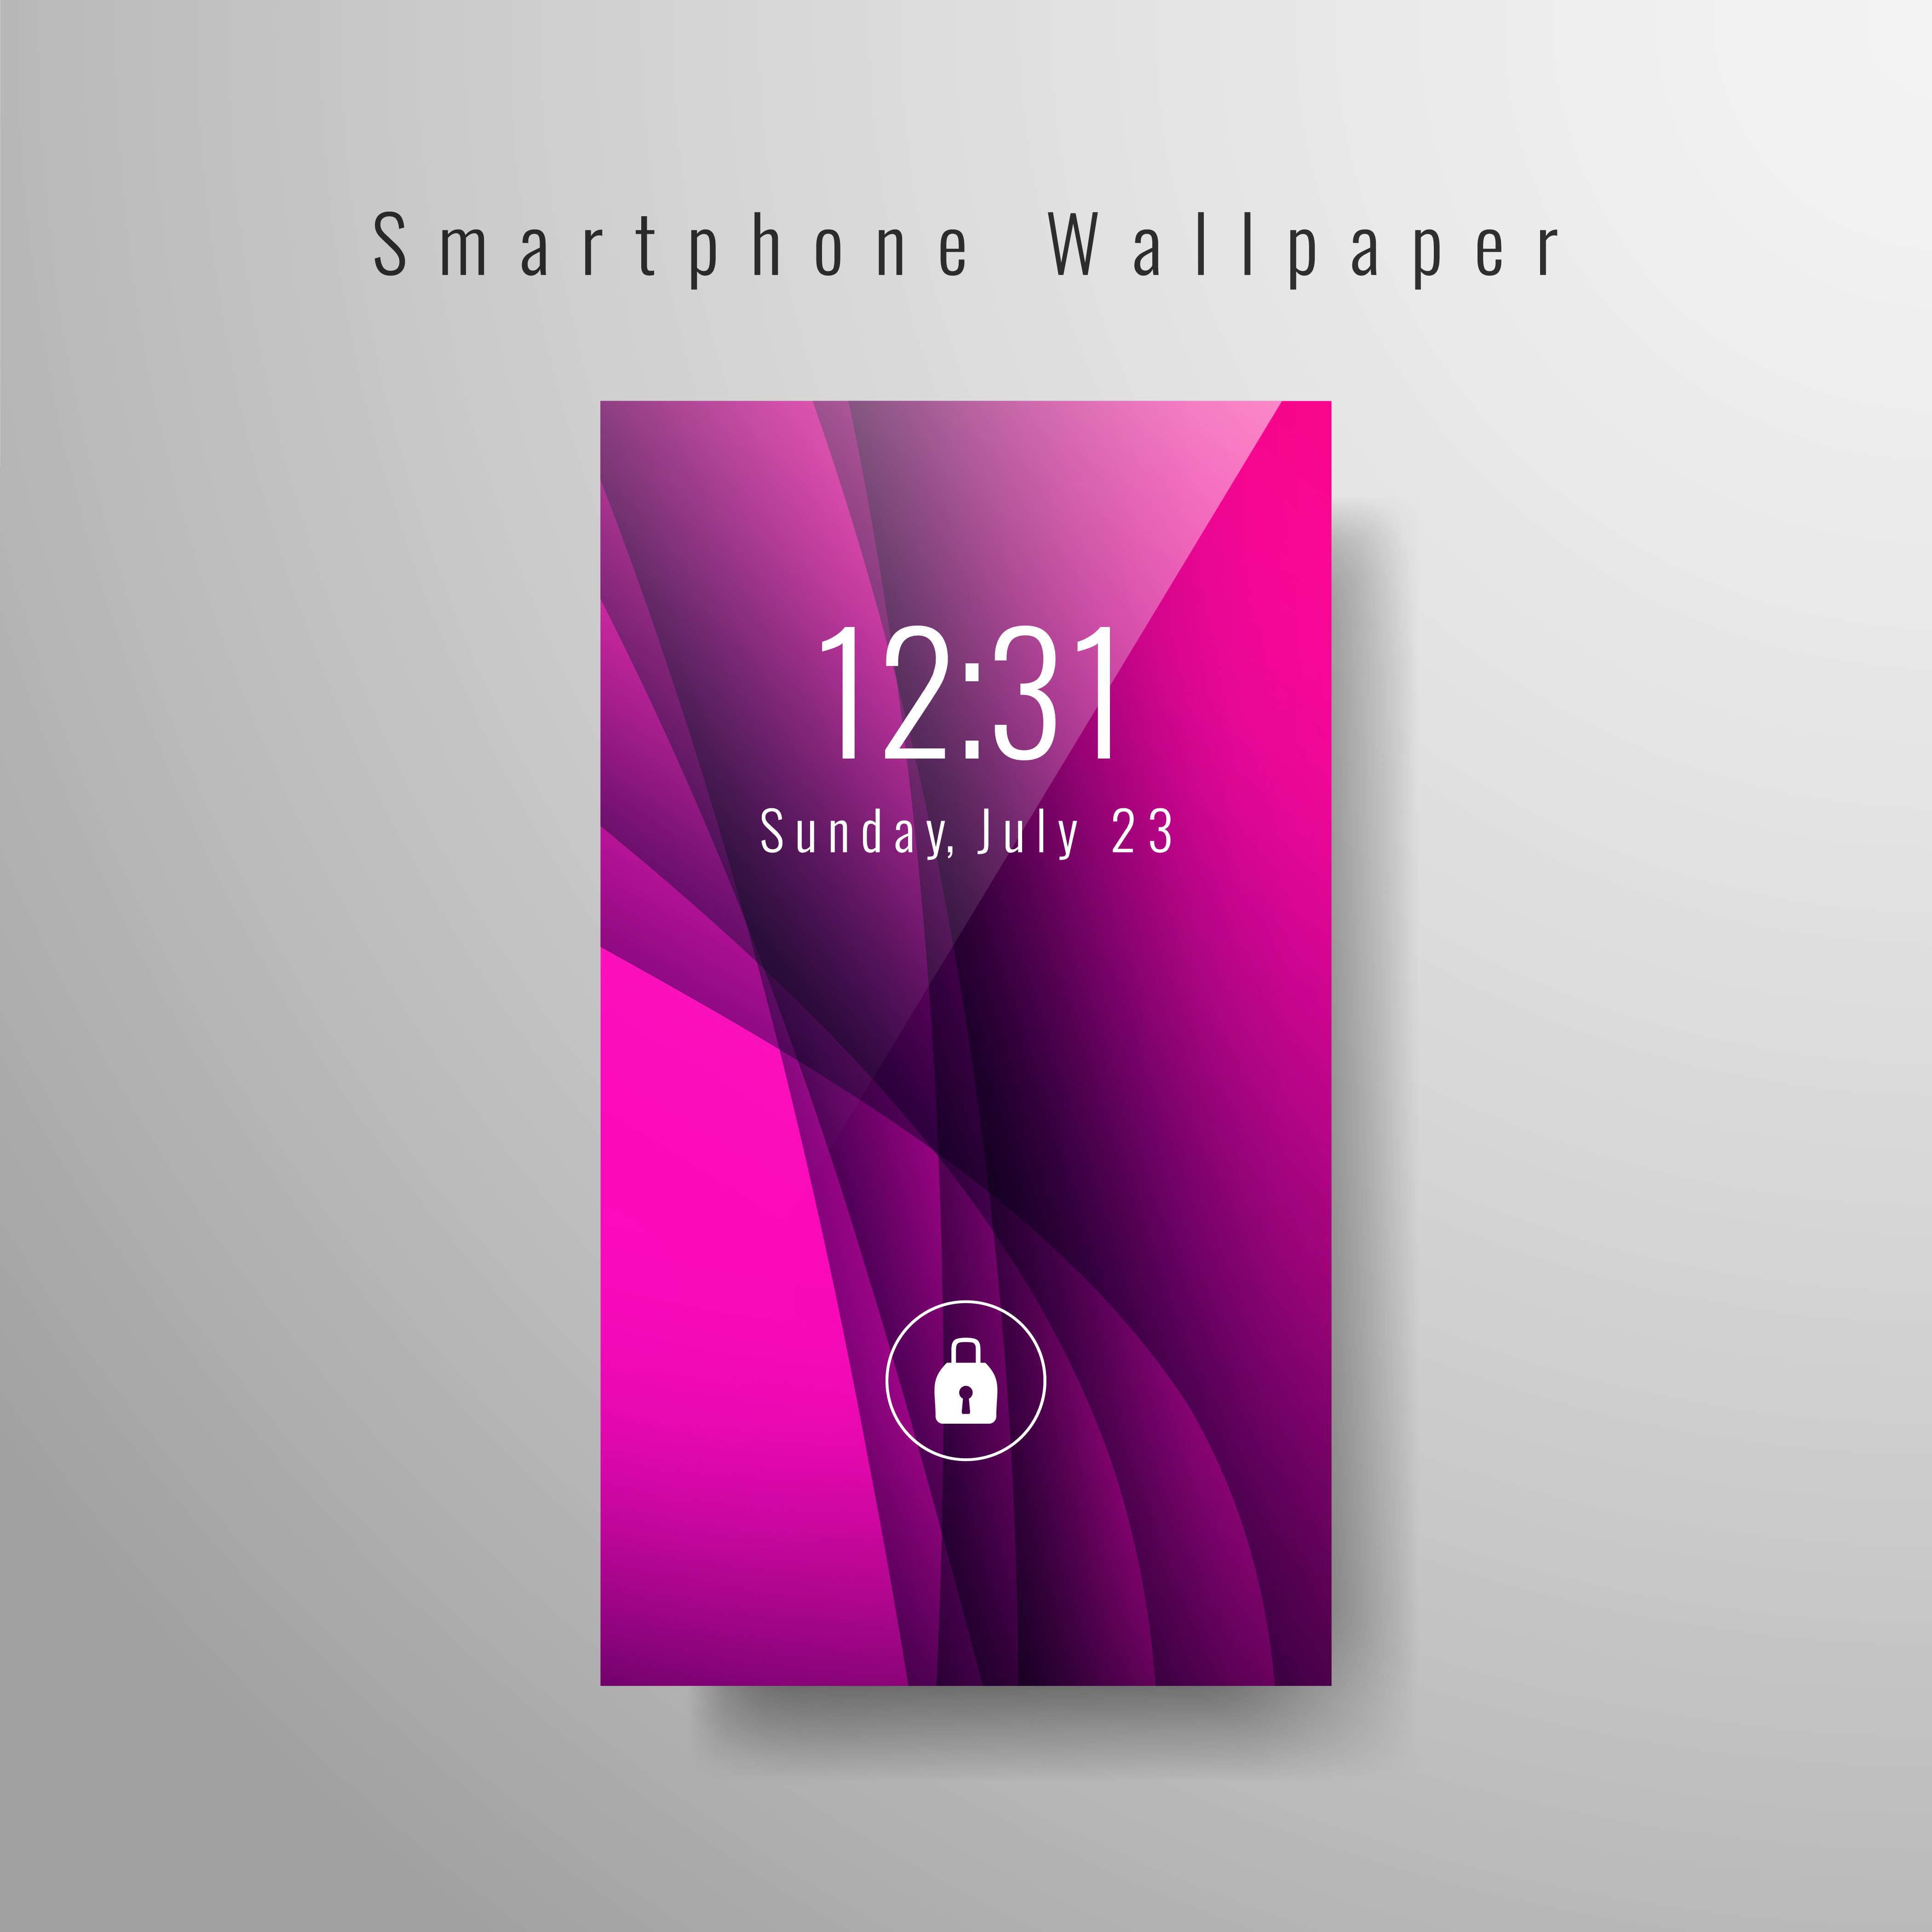 Abstract Smartphone Wallpaper Wavy Design